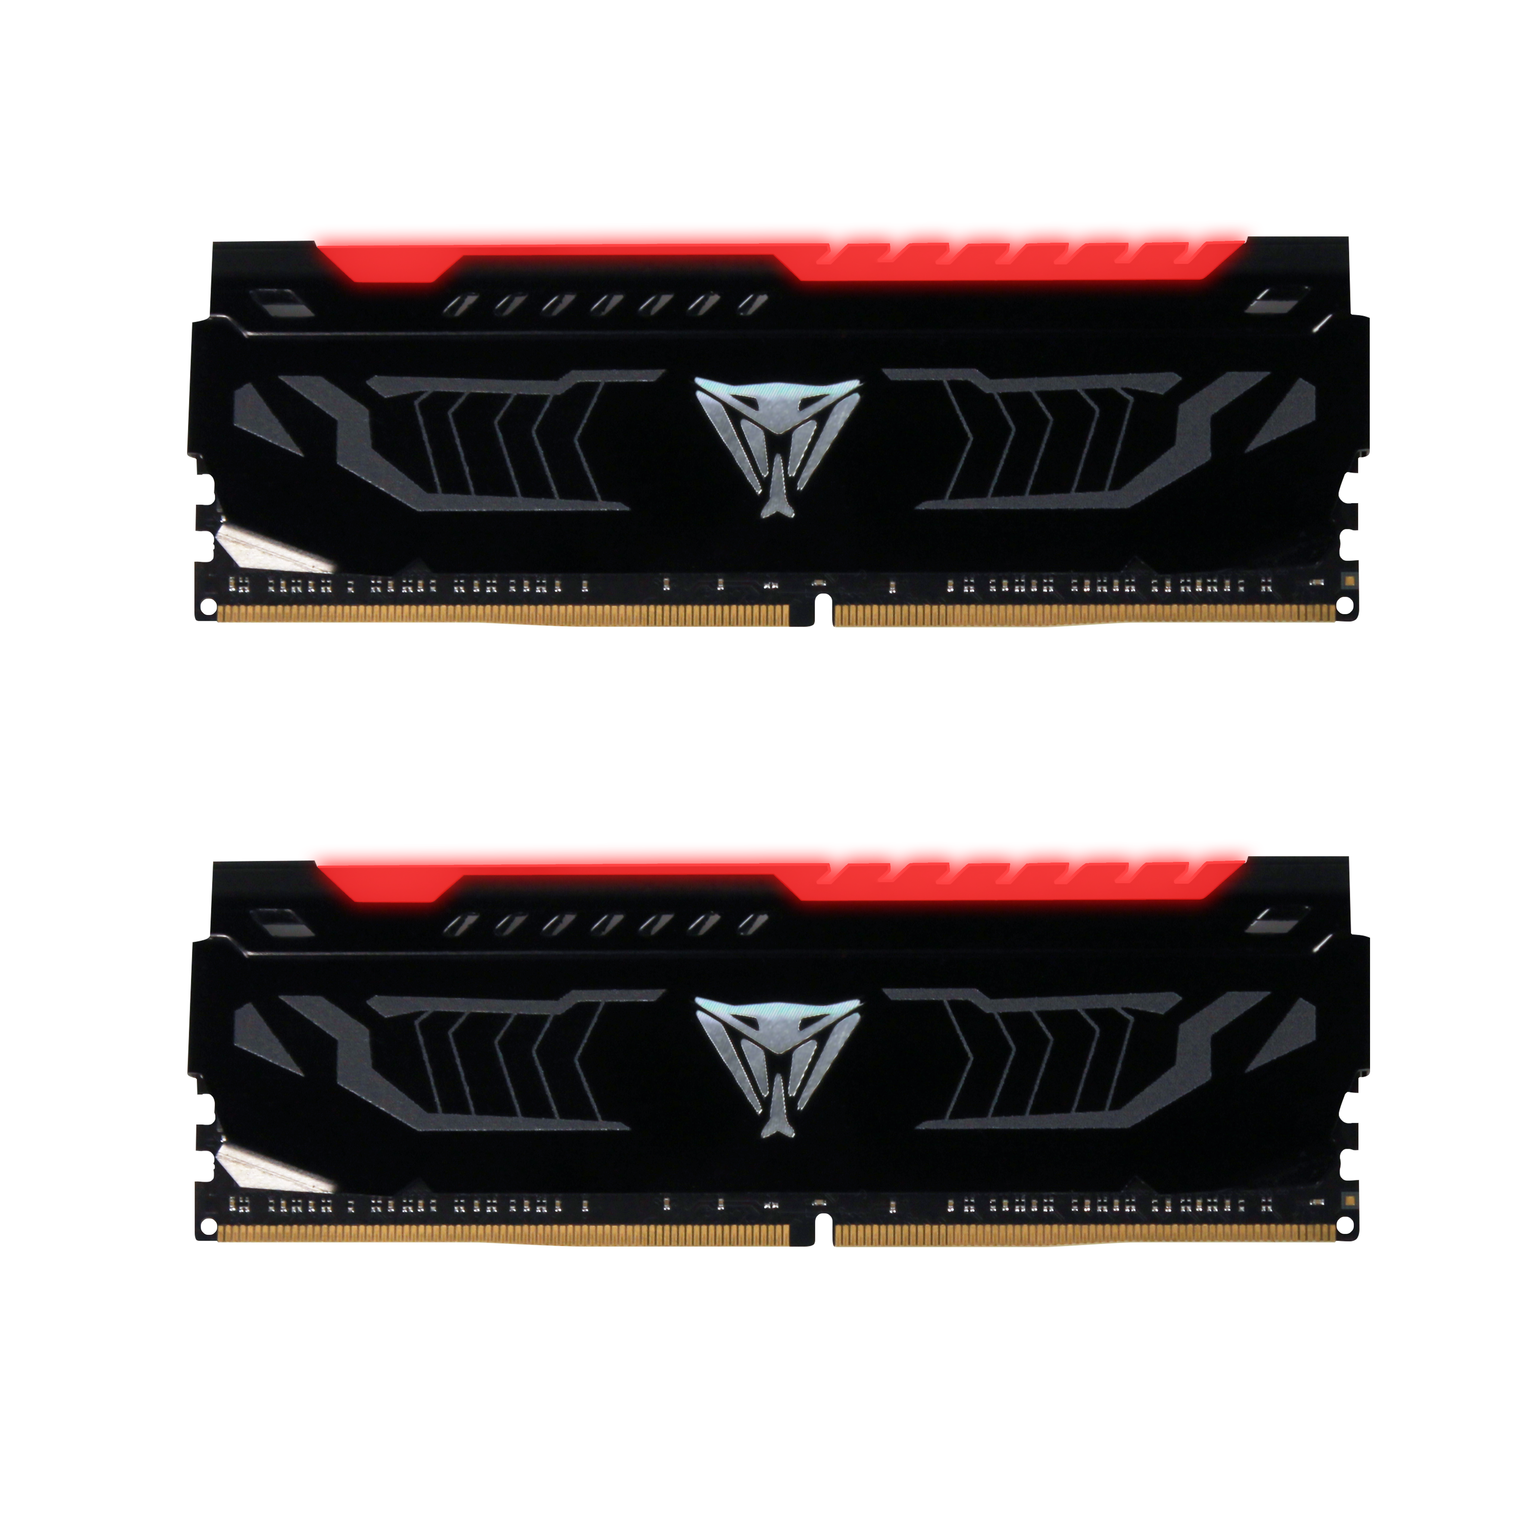 16GB DDR4-2400MHz Patriot Viper CL14 , 2x8GB červené LED